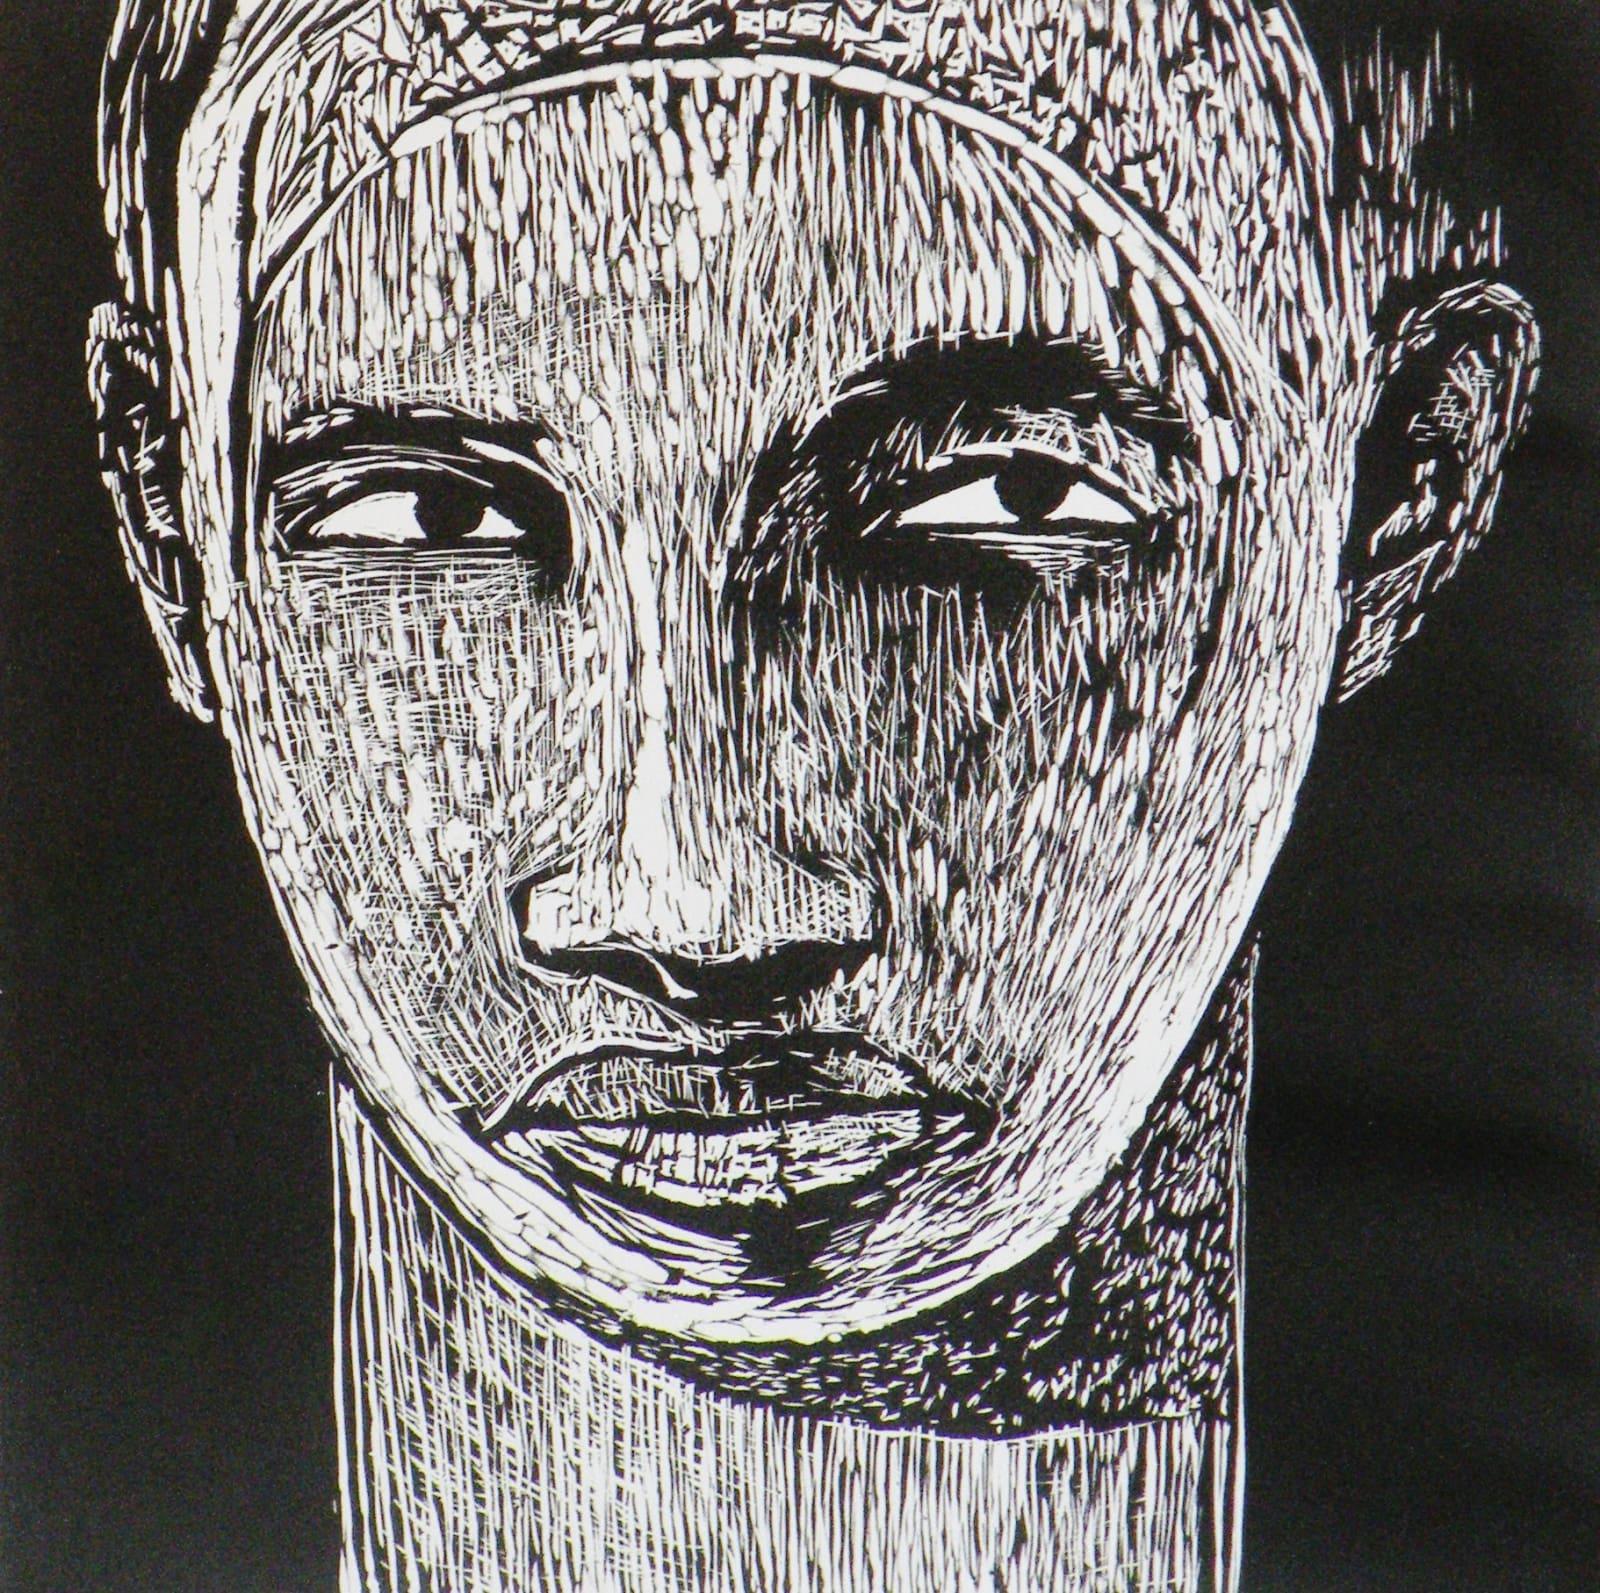 Samella Lewis, I See You, 2005.0